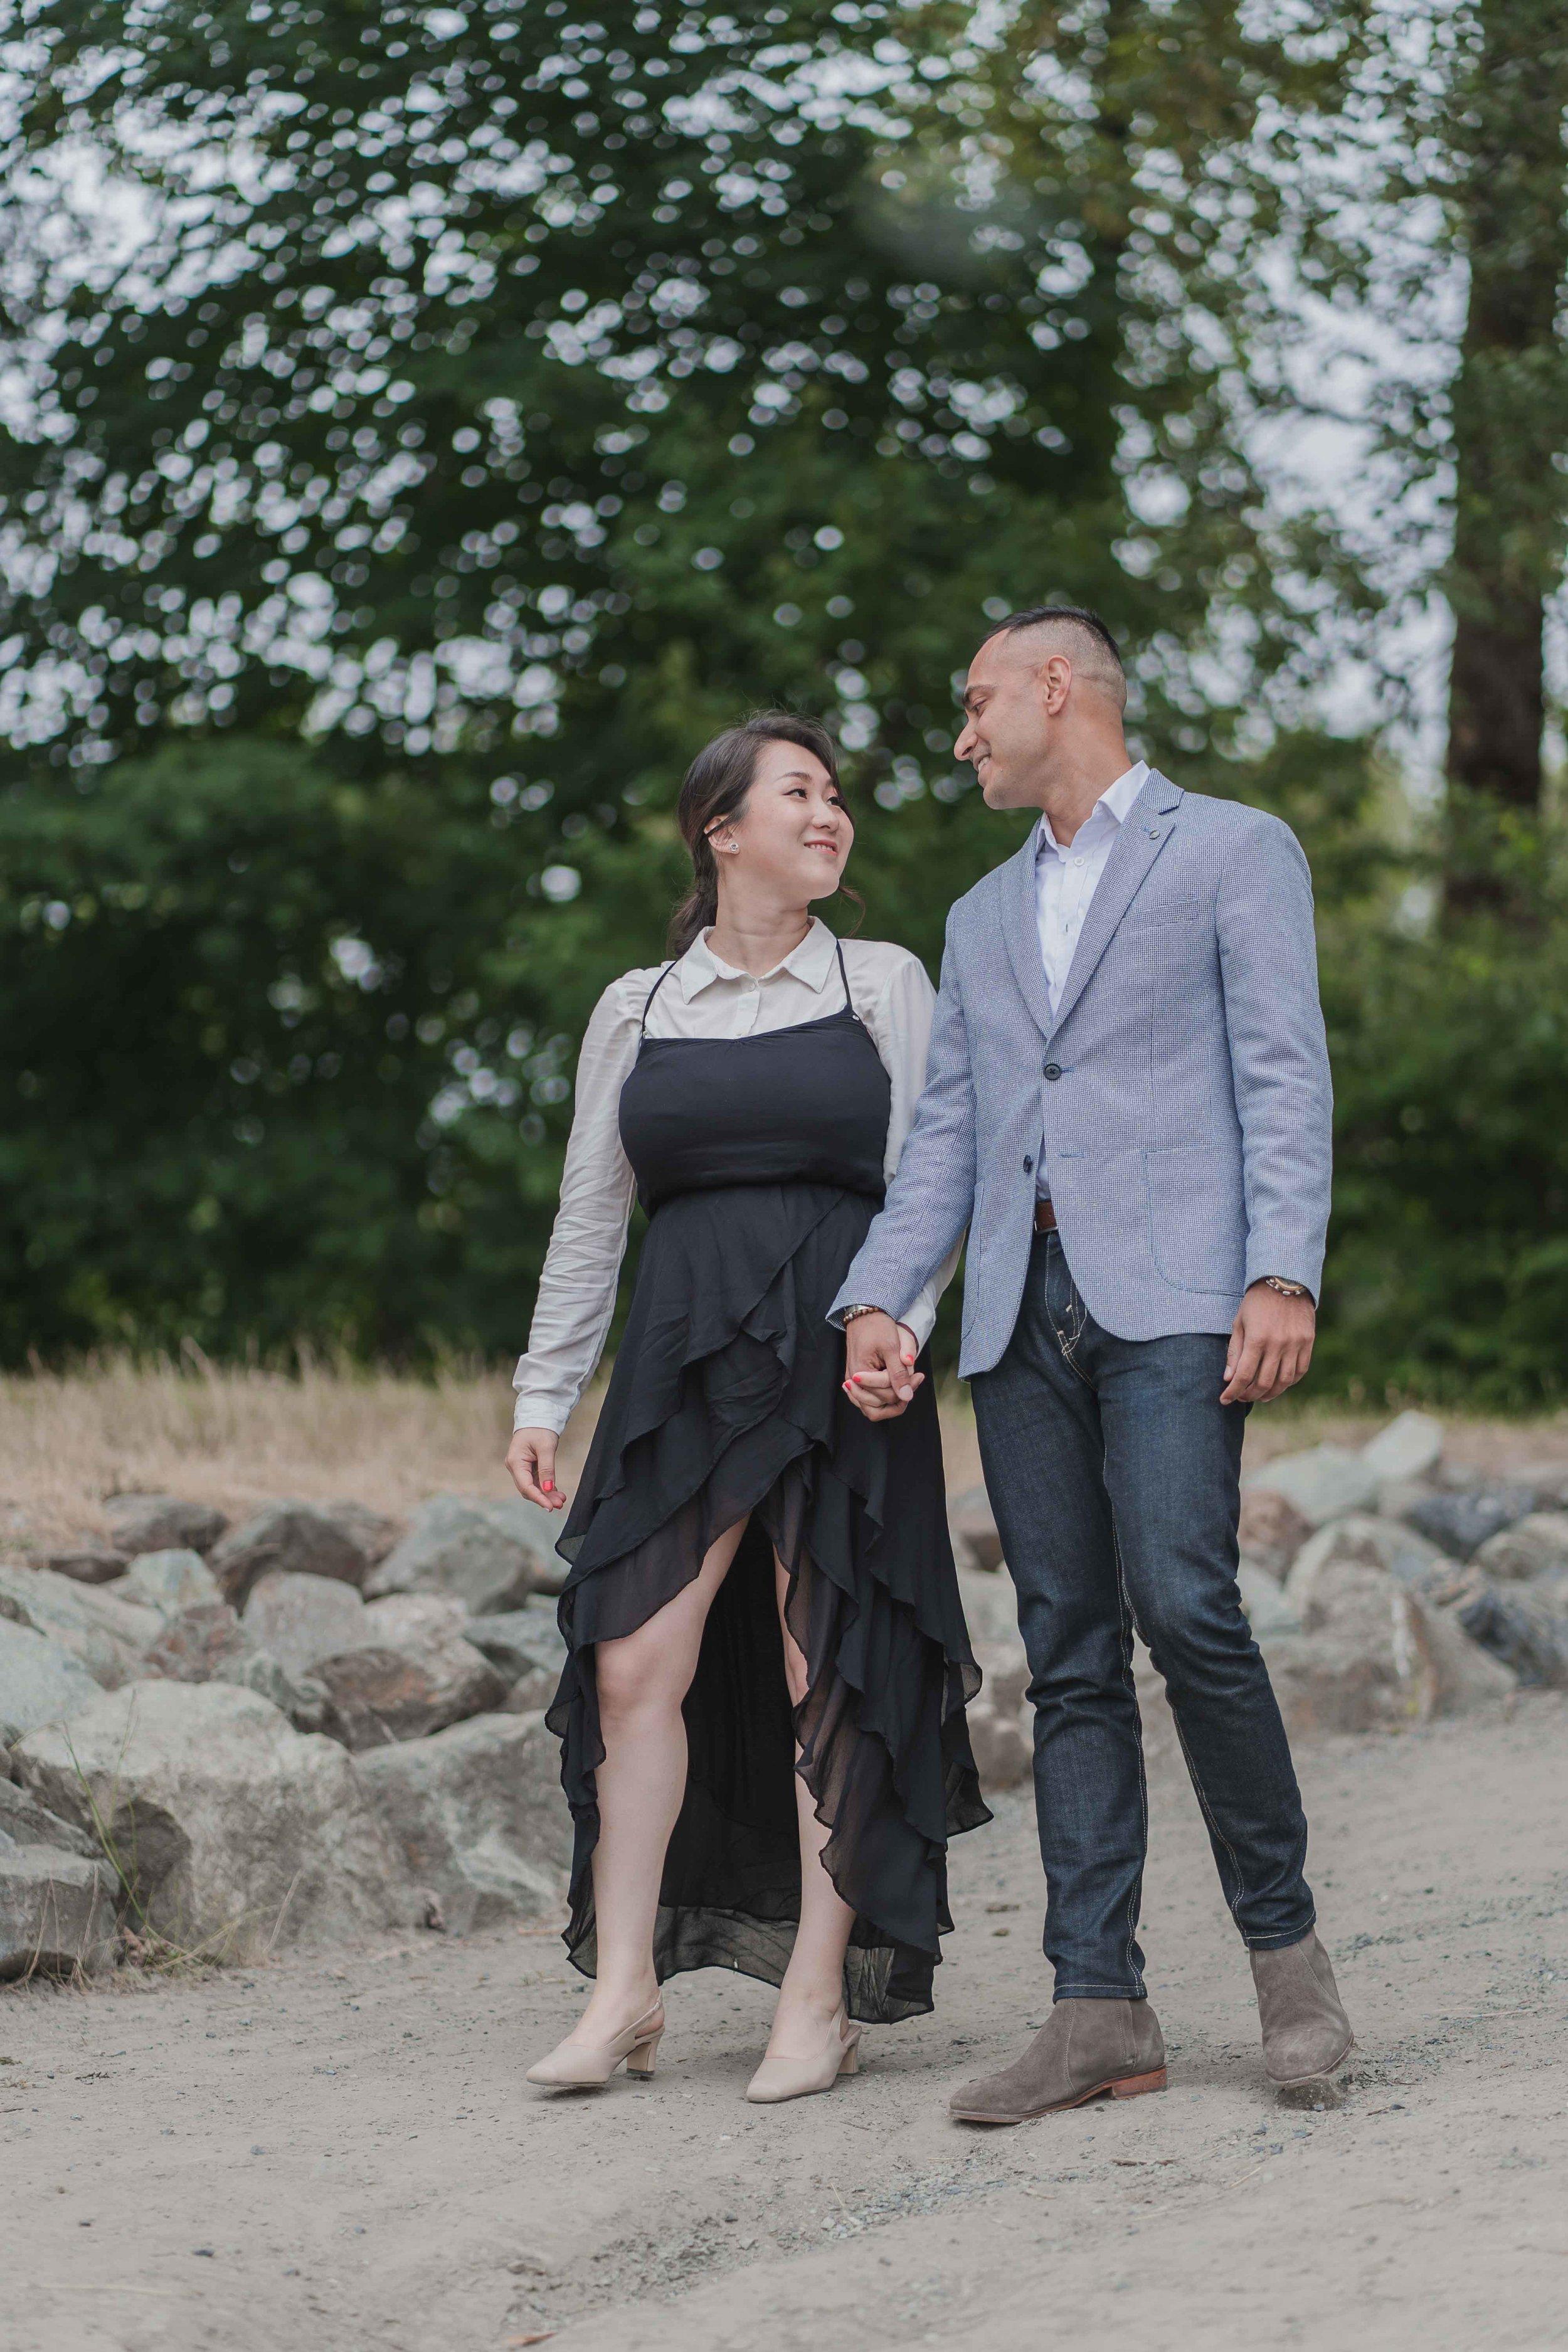 20190622 - Monika & Johnson Engagement - 0099.jpg